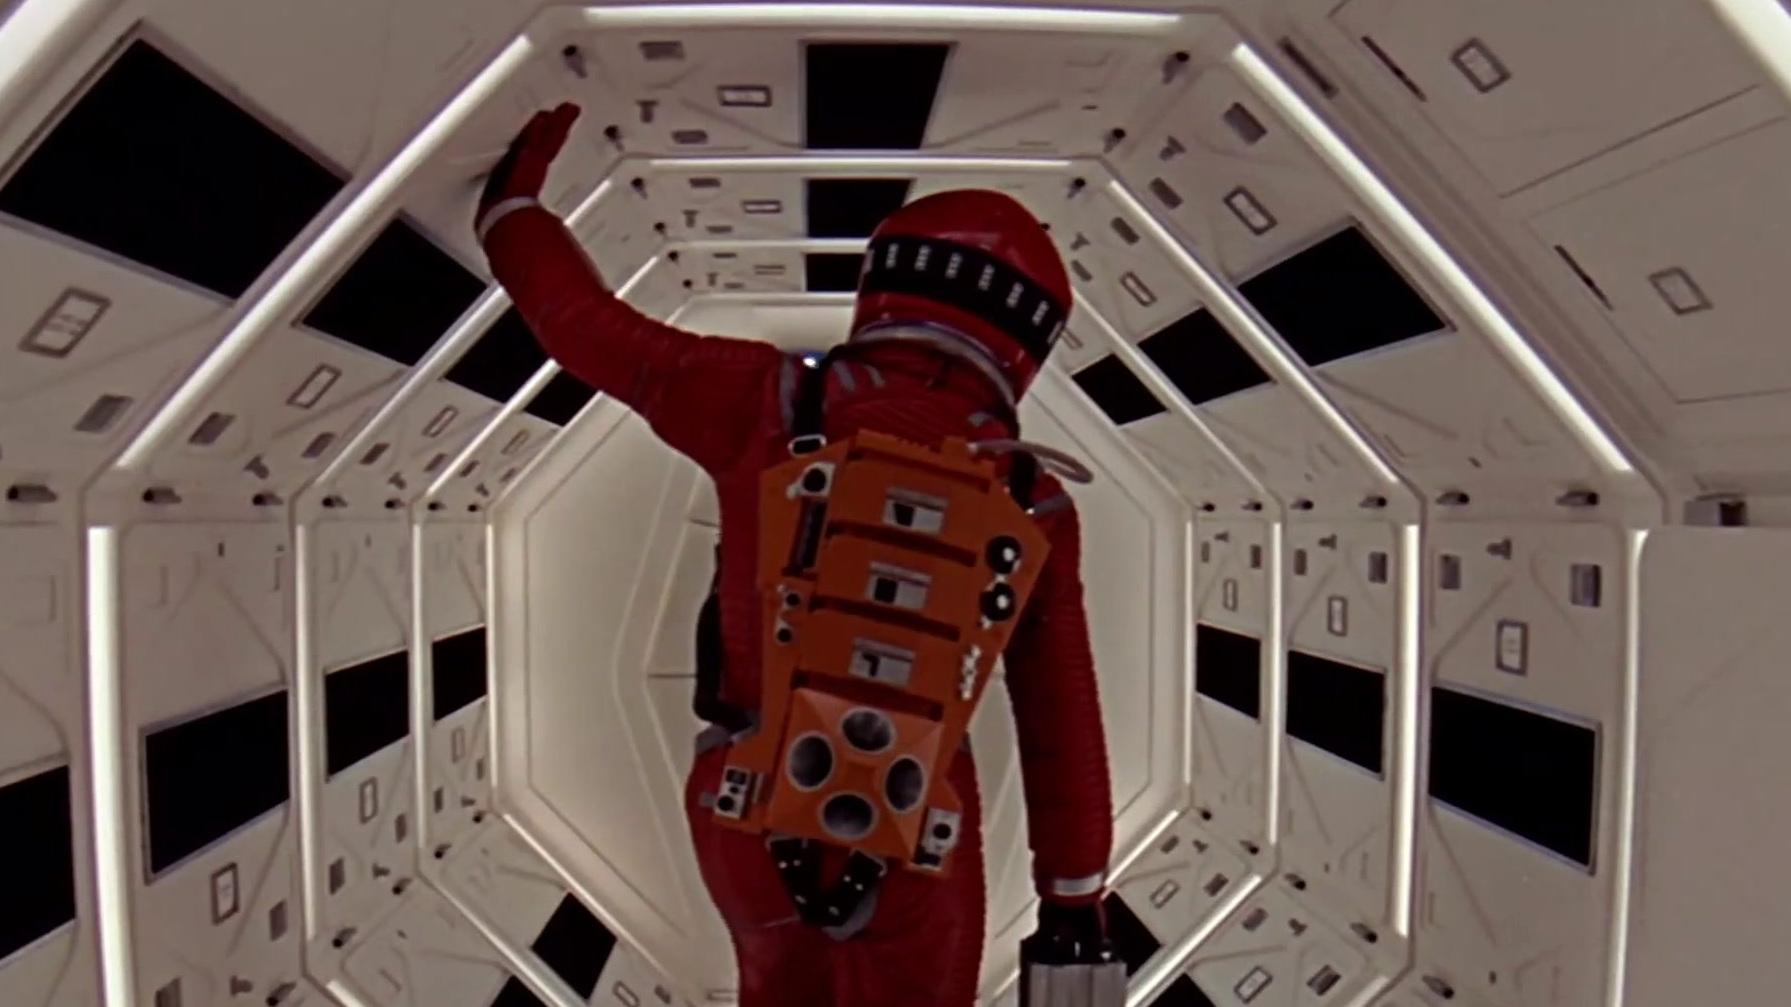 2001: A Space Odyssey (4K Trailer)